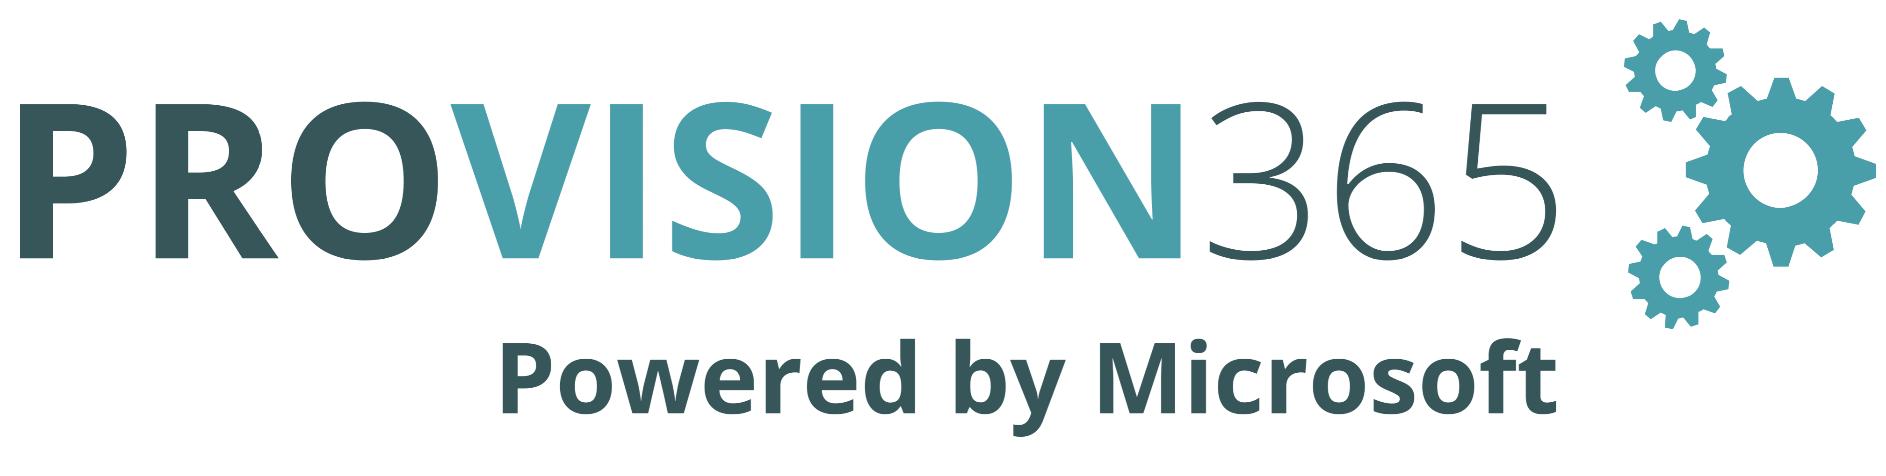 Provision 365 logo 2019